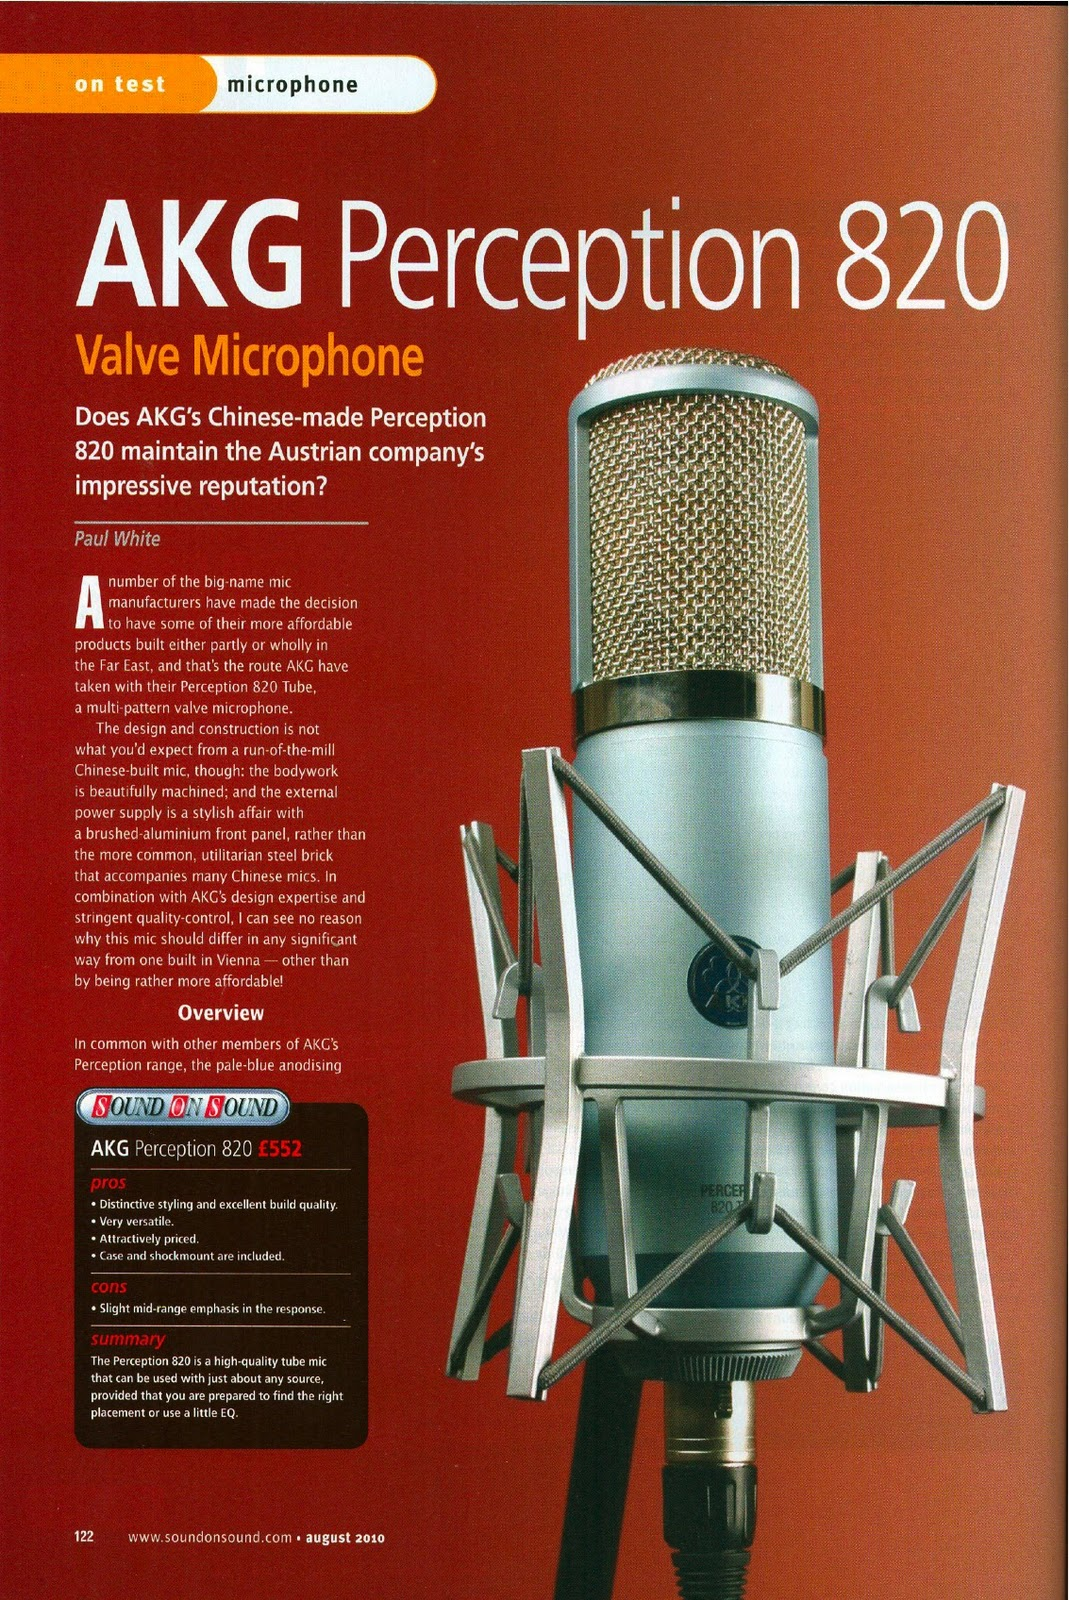 Harman Luxury Audio News: Pick Of The Hits - Sound On Sound - AKG Perception 820